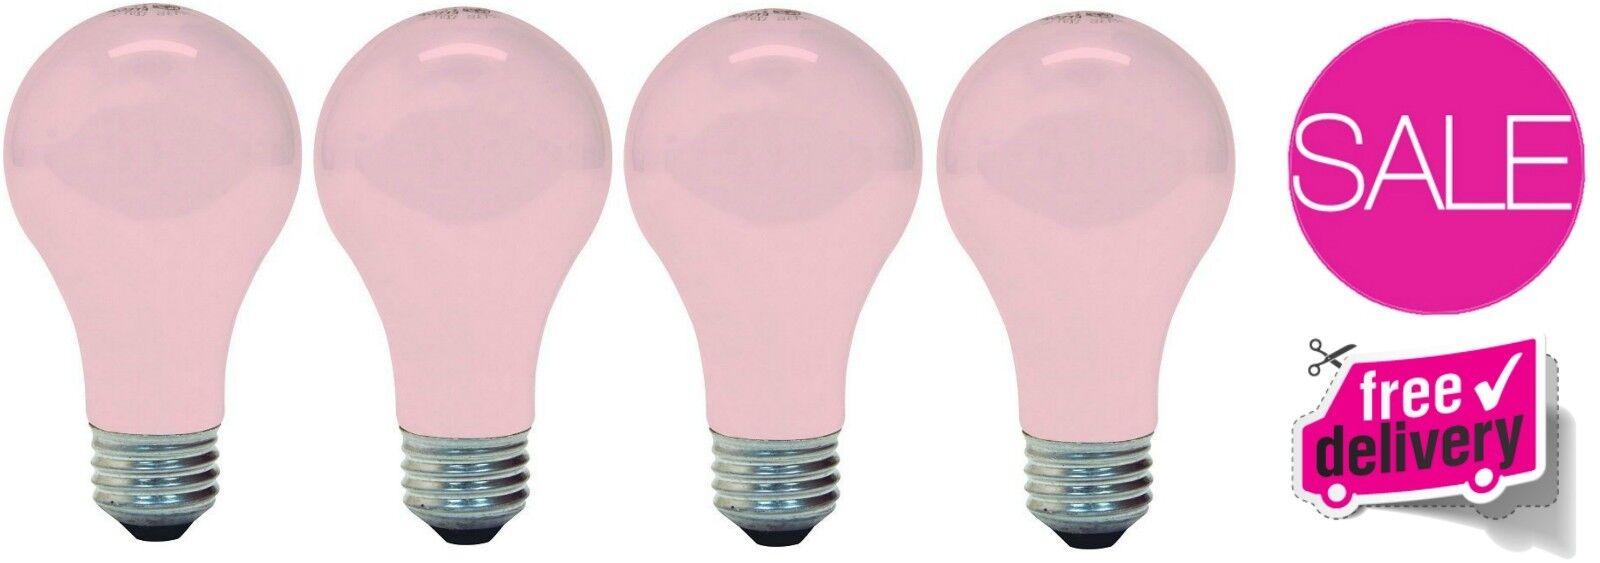 4 Pack GE Soft Pink Light Bulb 60W 675 Lumens Medium Base Lo